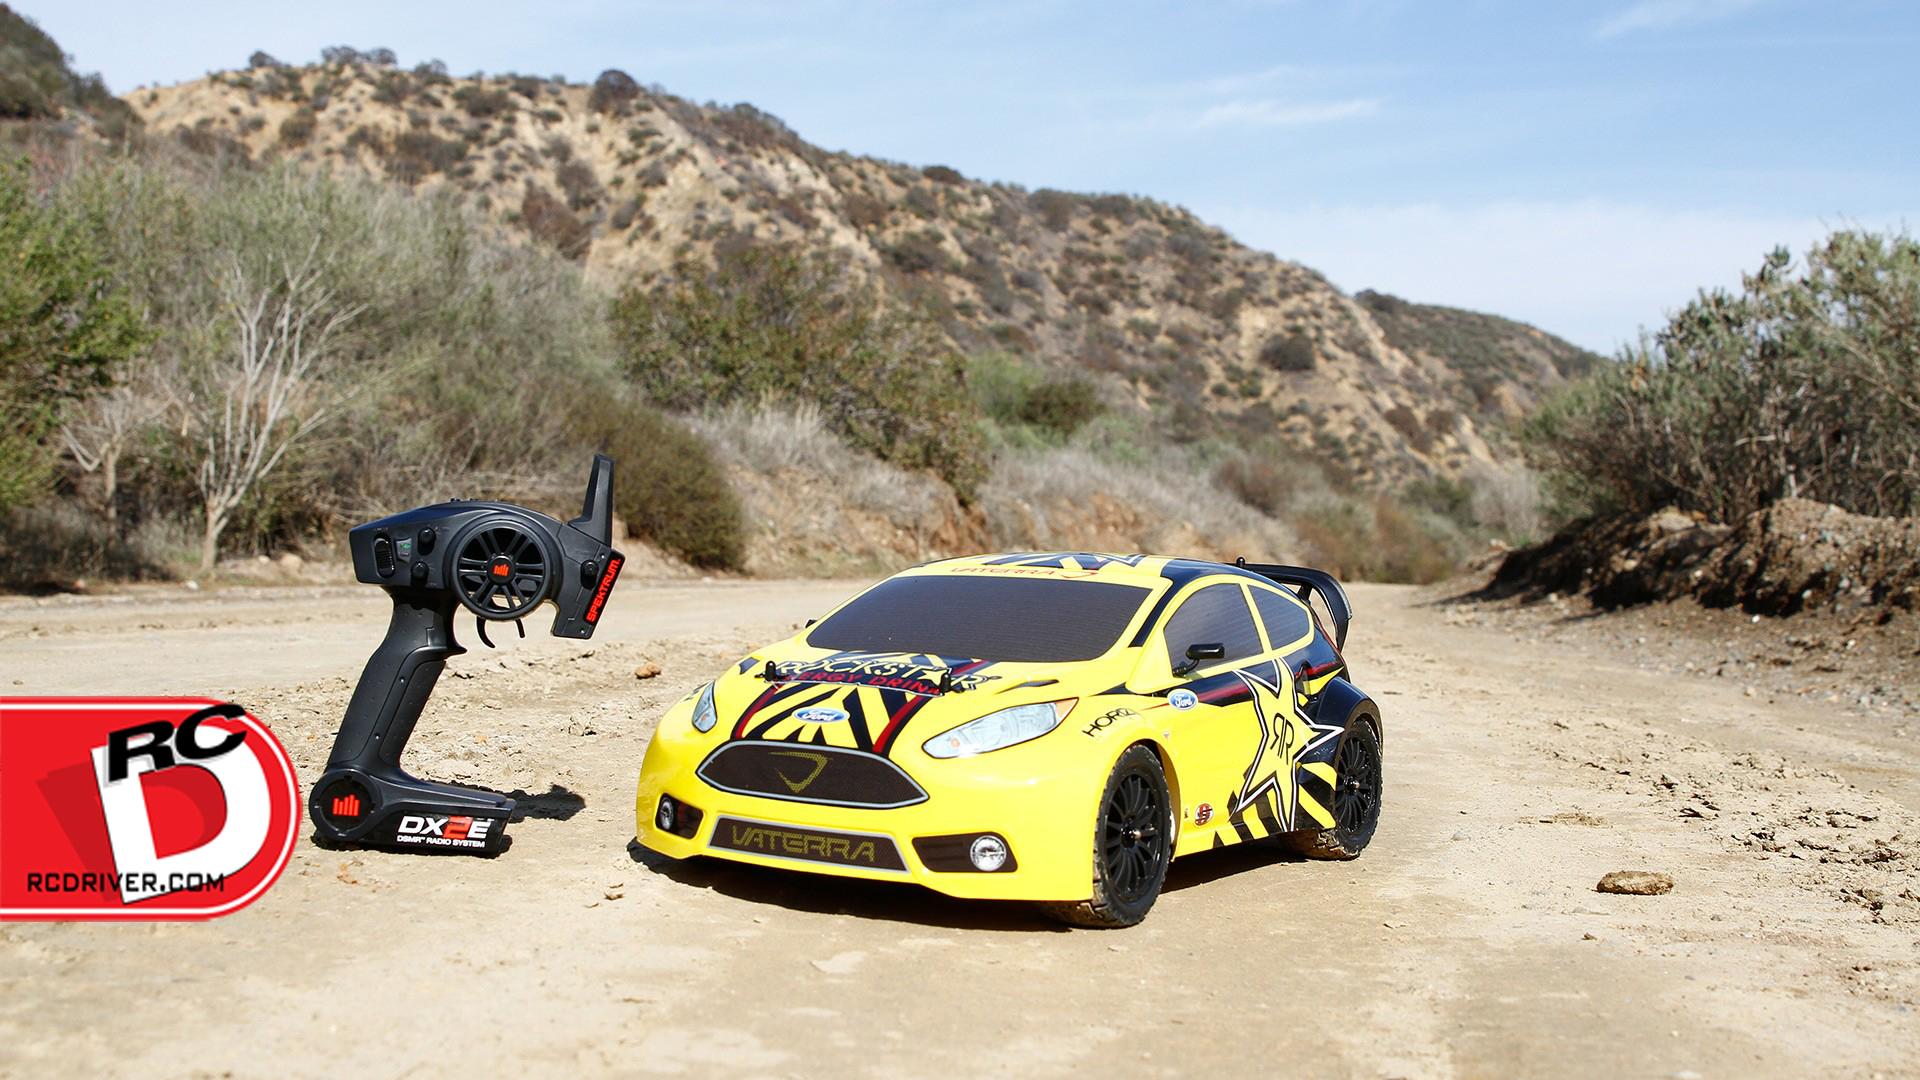 Vaterra Rockstar Ford Fiesta Rallycross